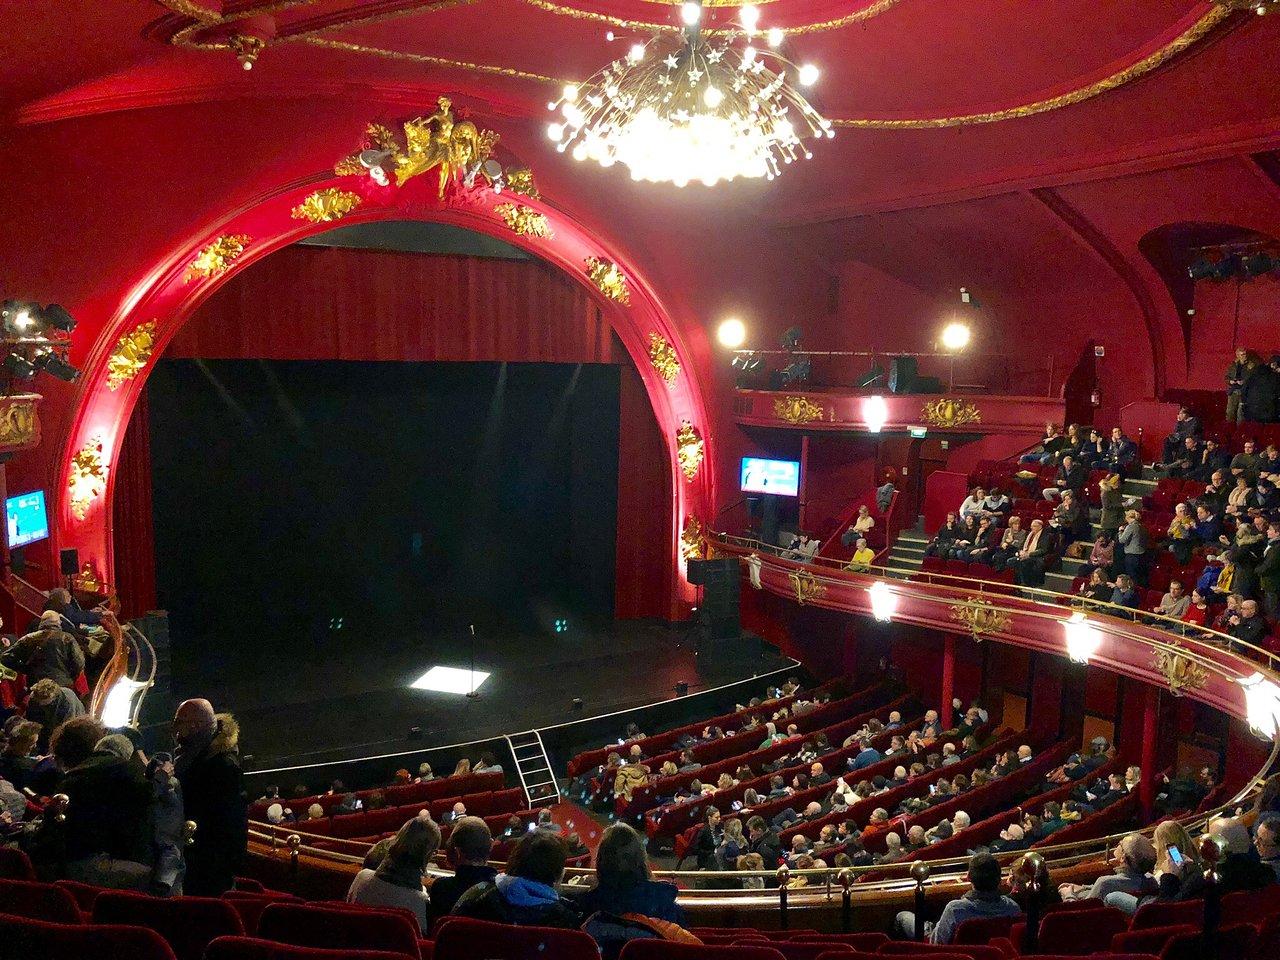 Maison Du Convertible Sebastopol theatre sebastopol (lille) - 2020 all you need to know